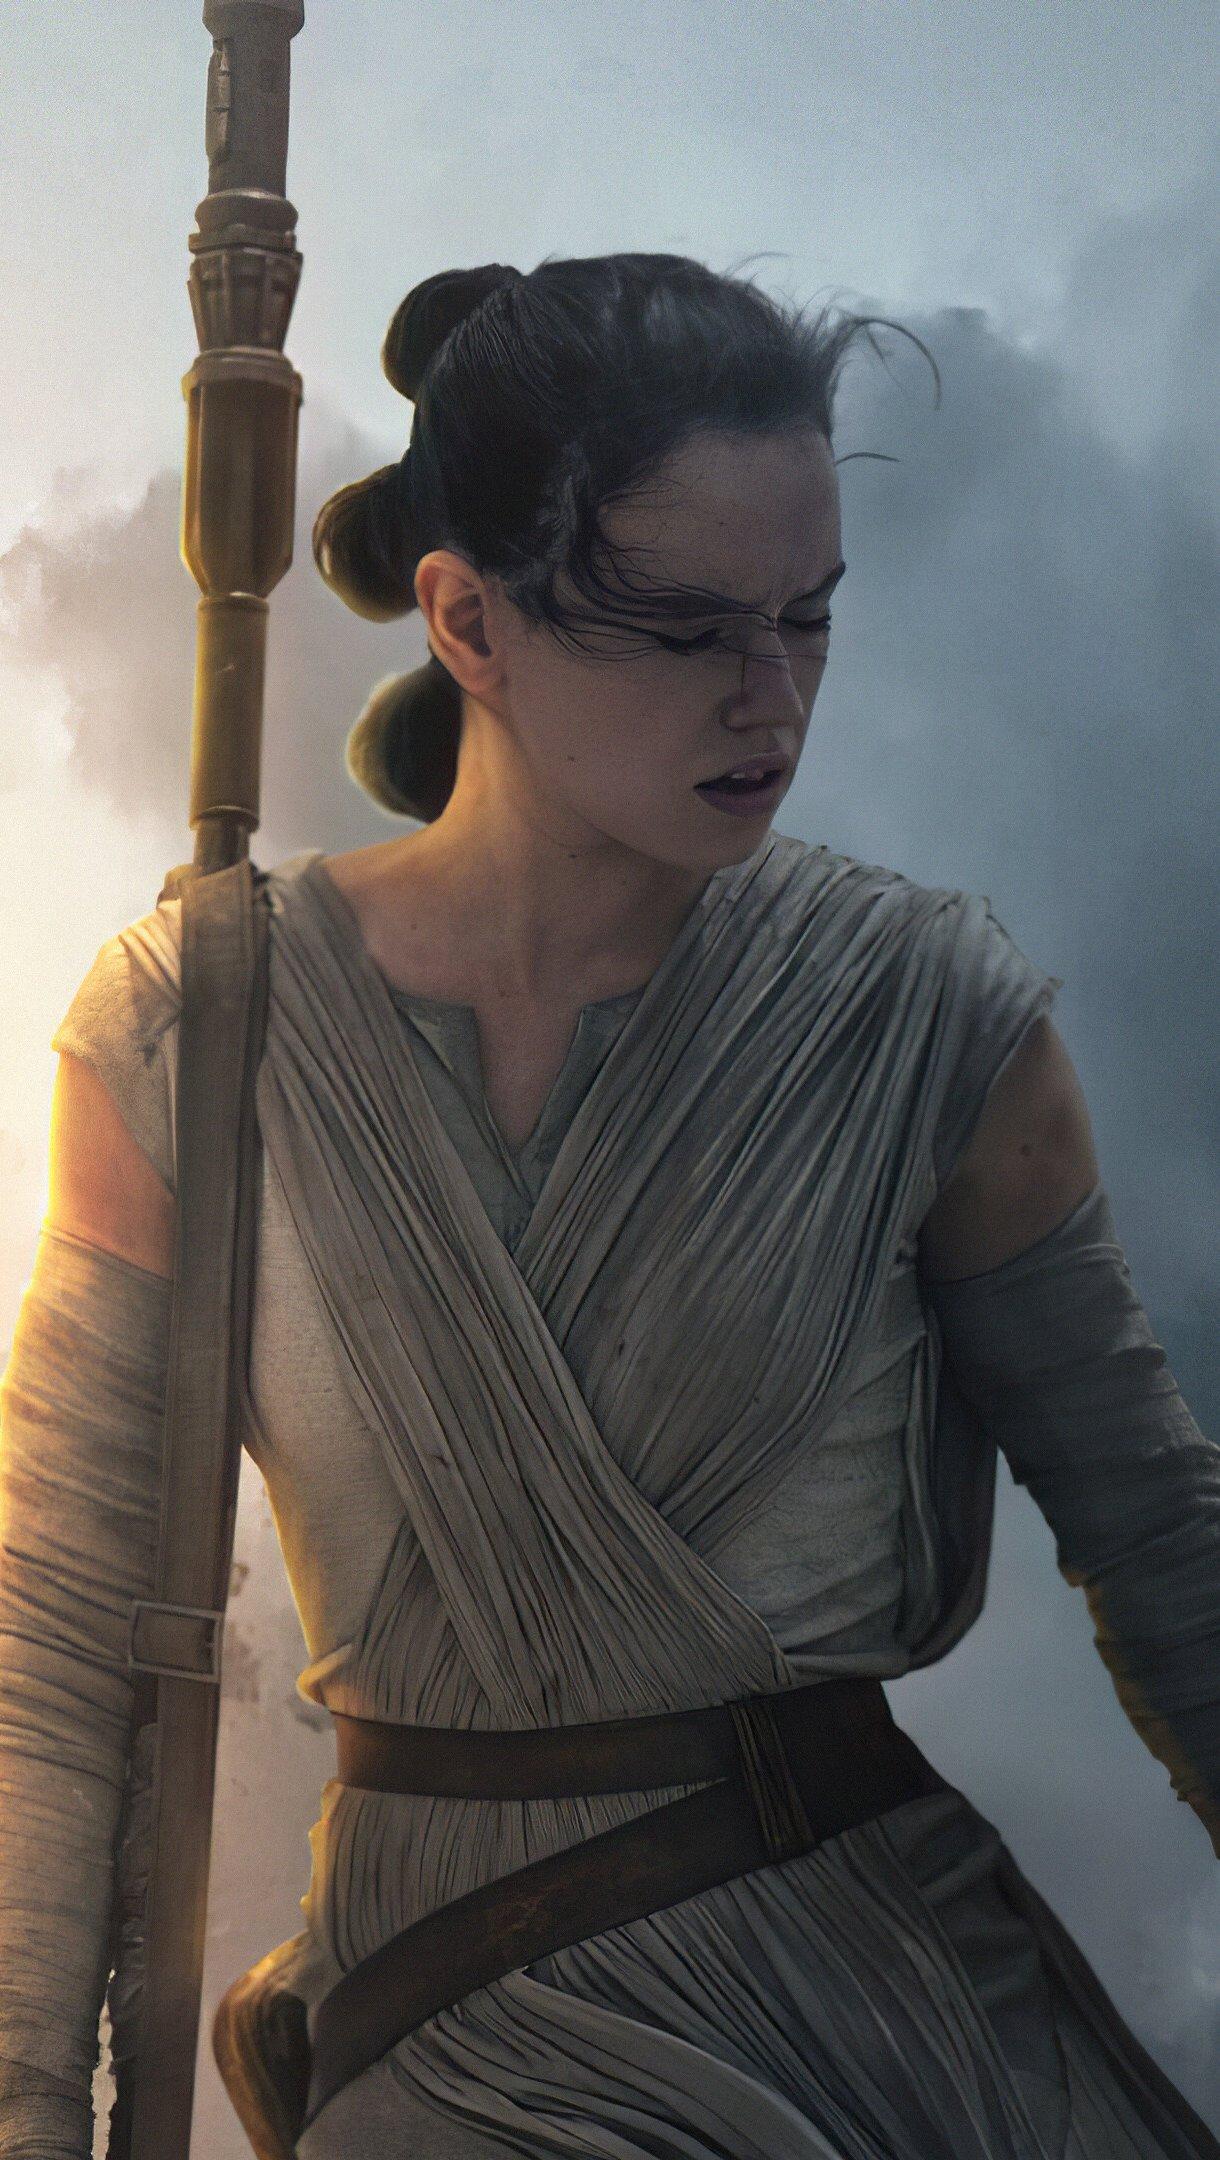 Fondos de pantalla Rey de Star Wars El ascenso del skywalker Vertical